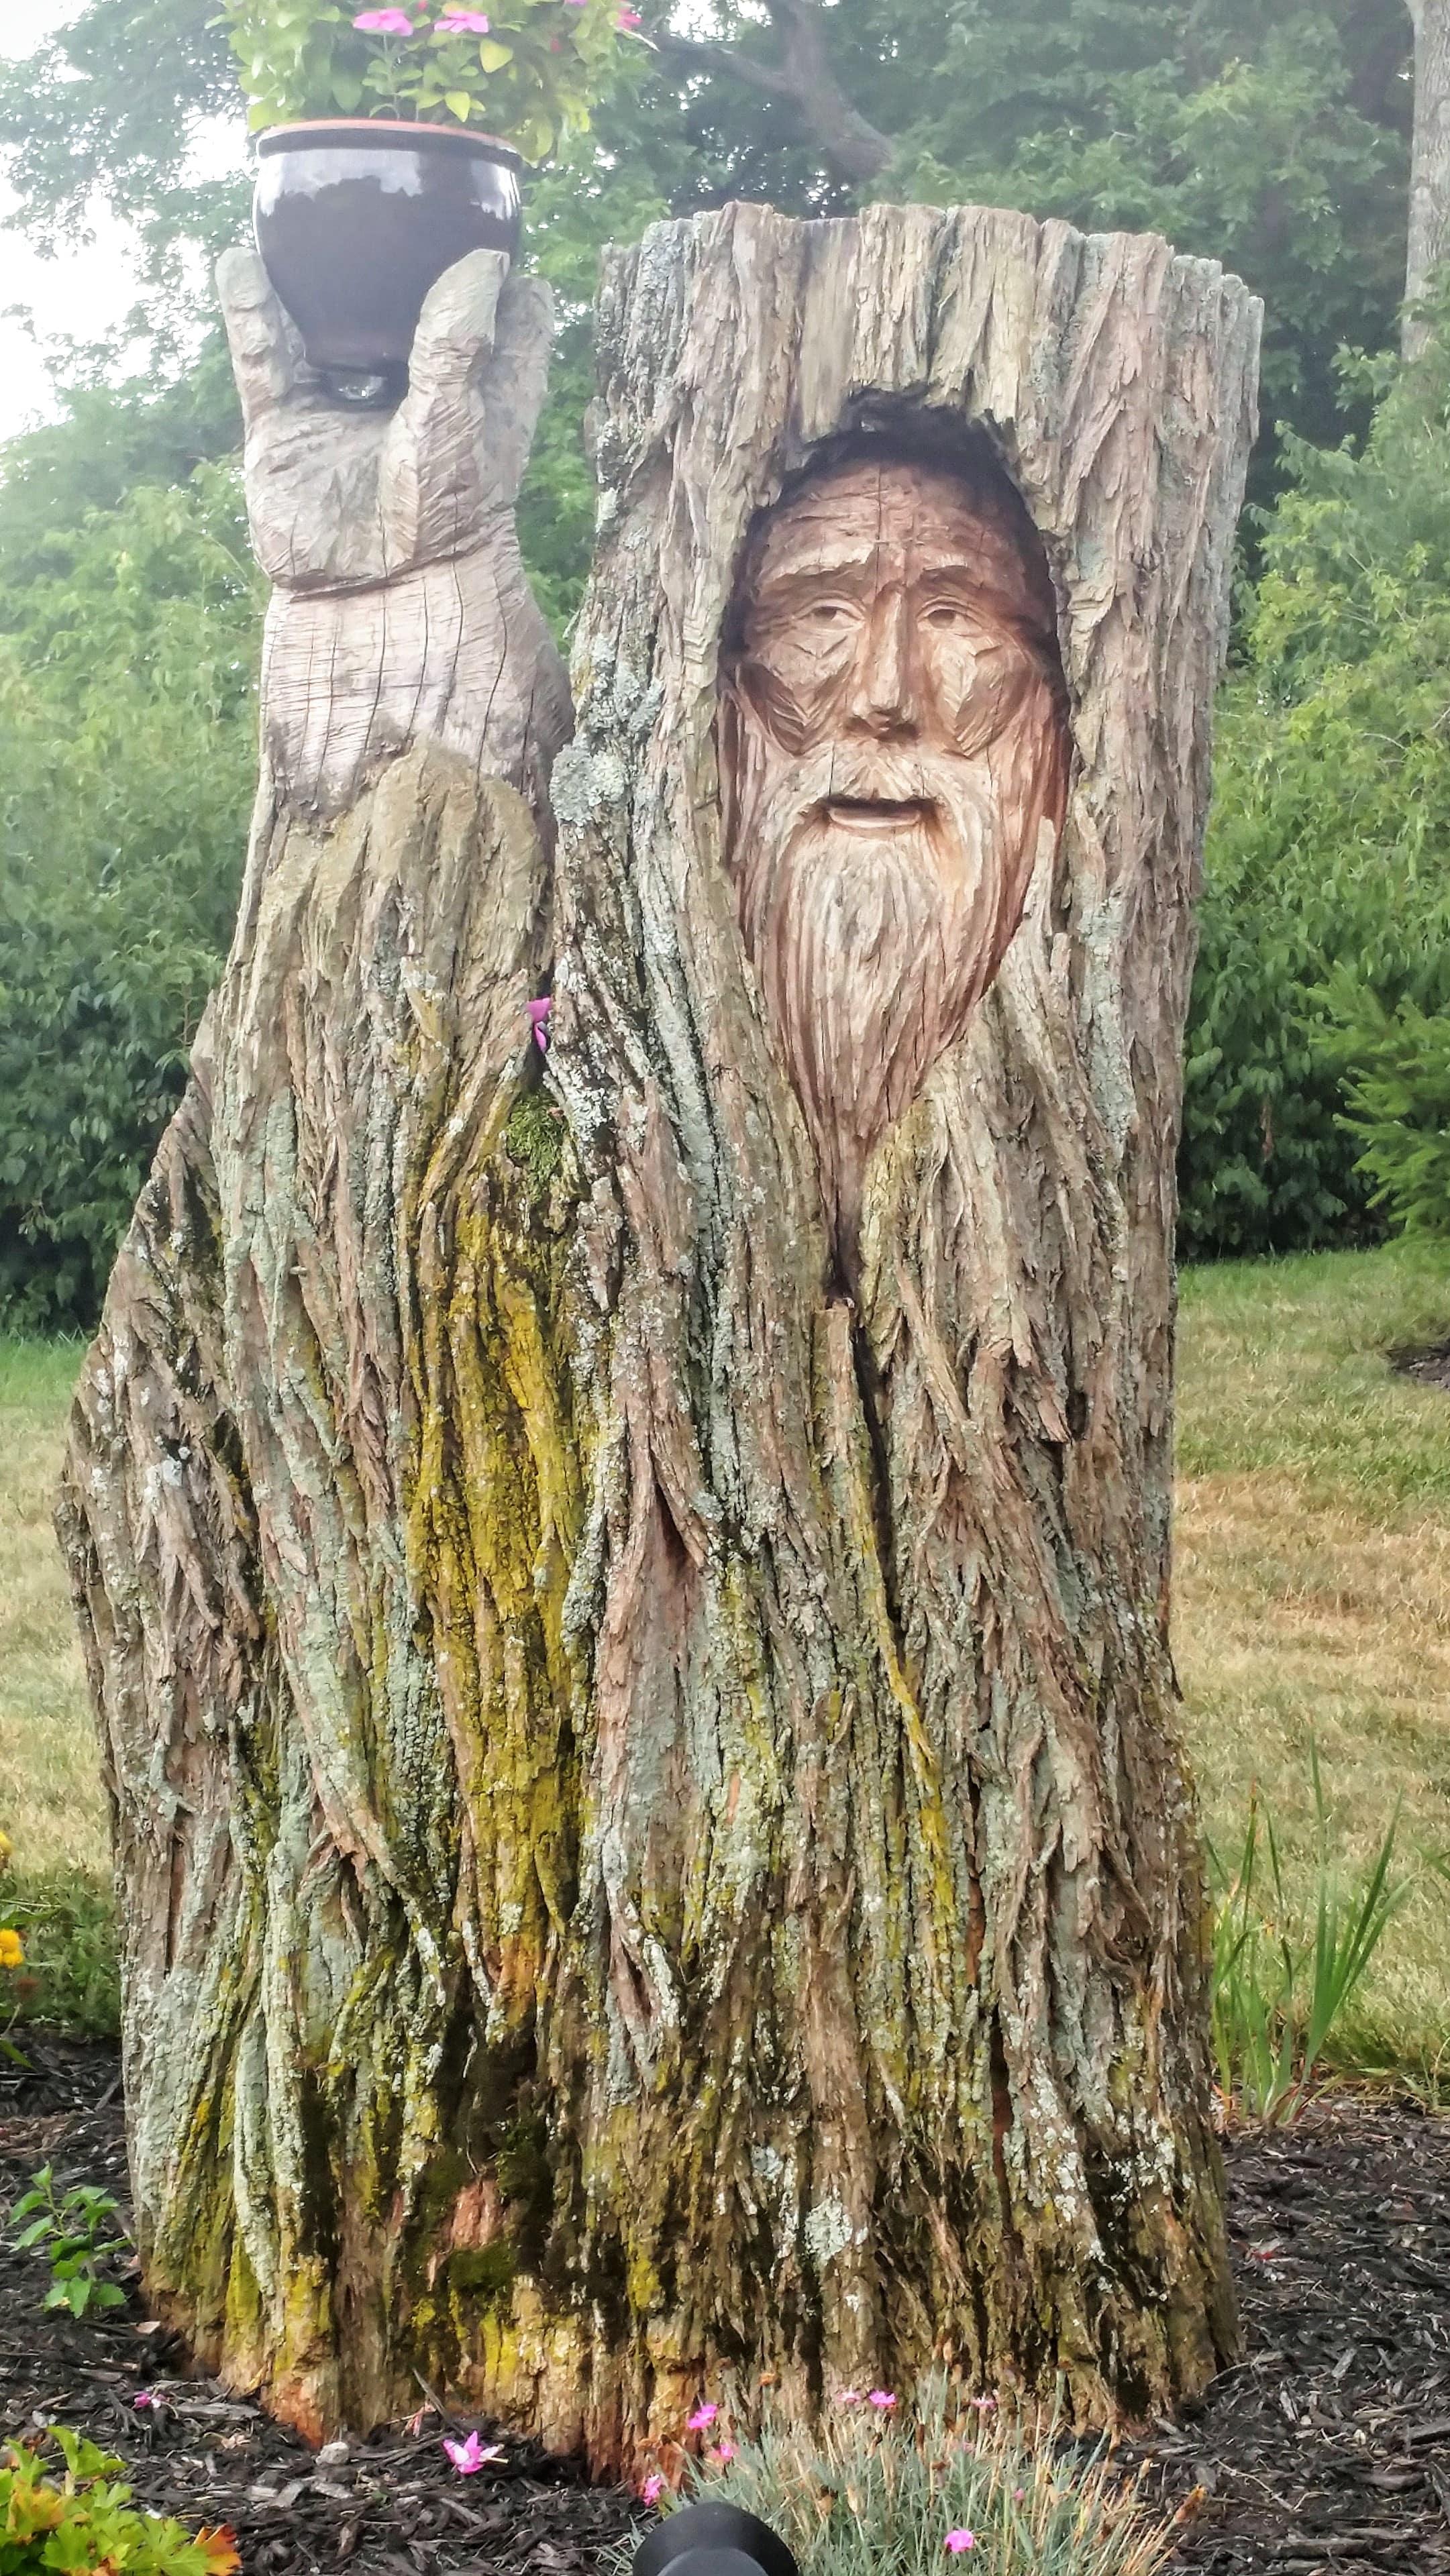 treeface1-min.jpg